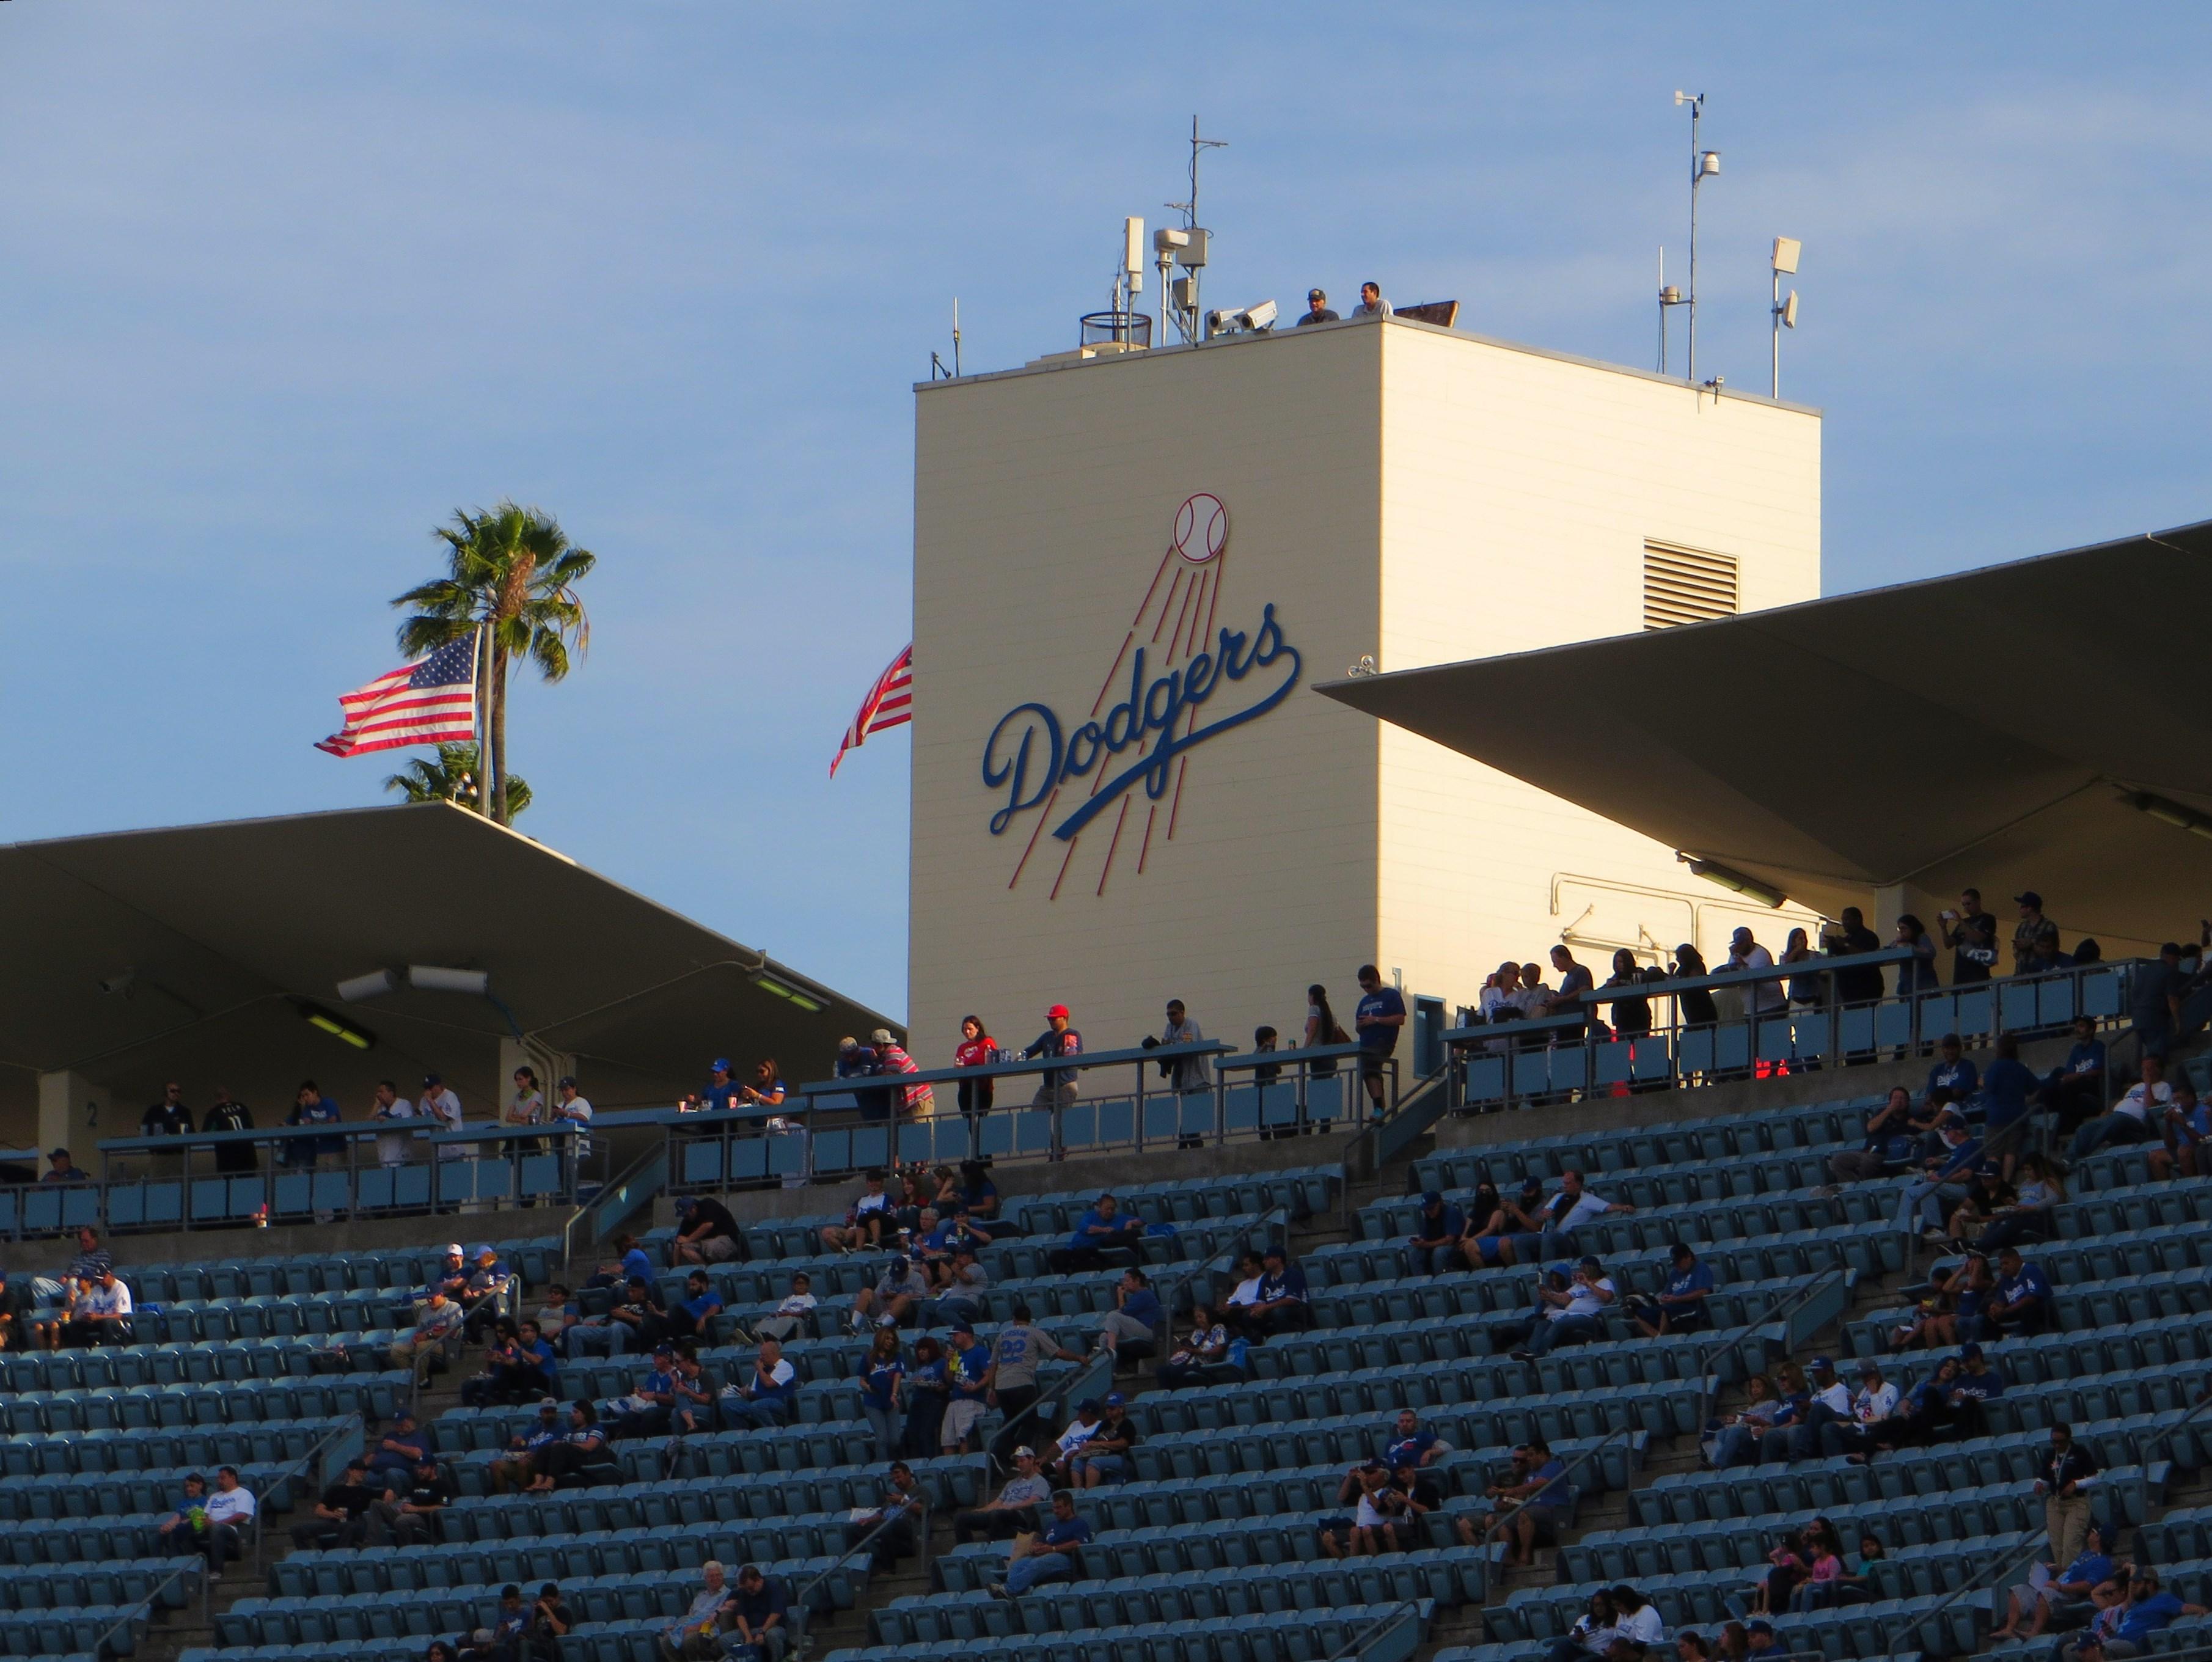 File:Dodger Stadium, Los Angeles, California (14514462051).jpg - Wikimedia Commons